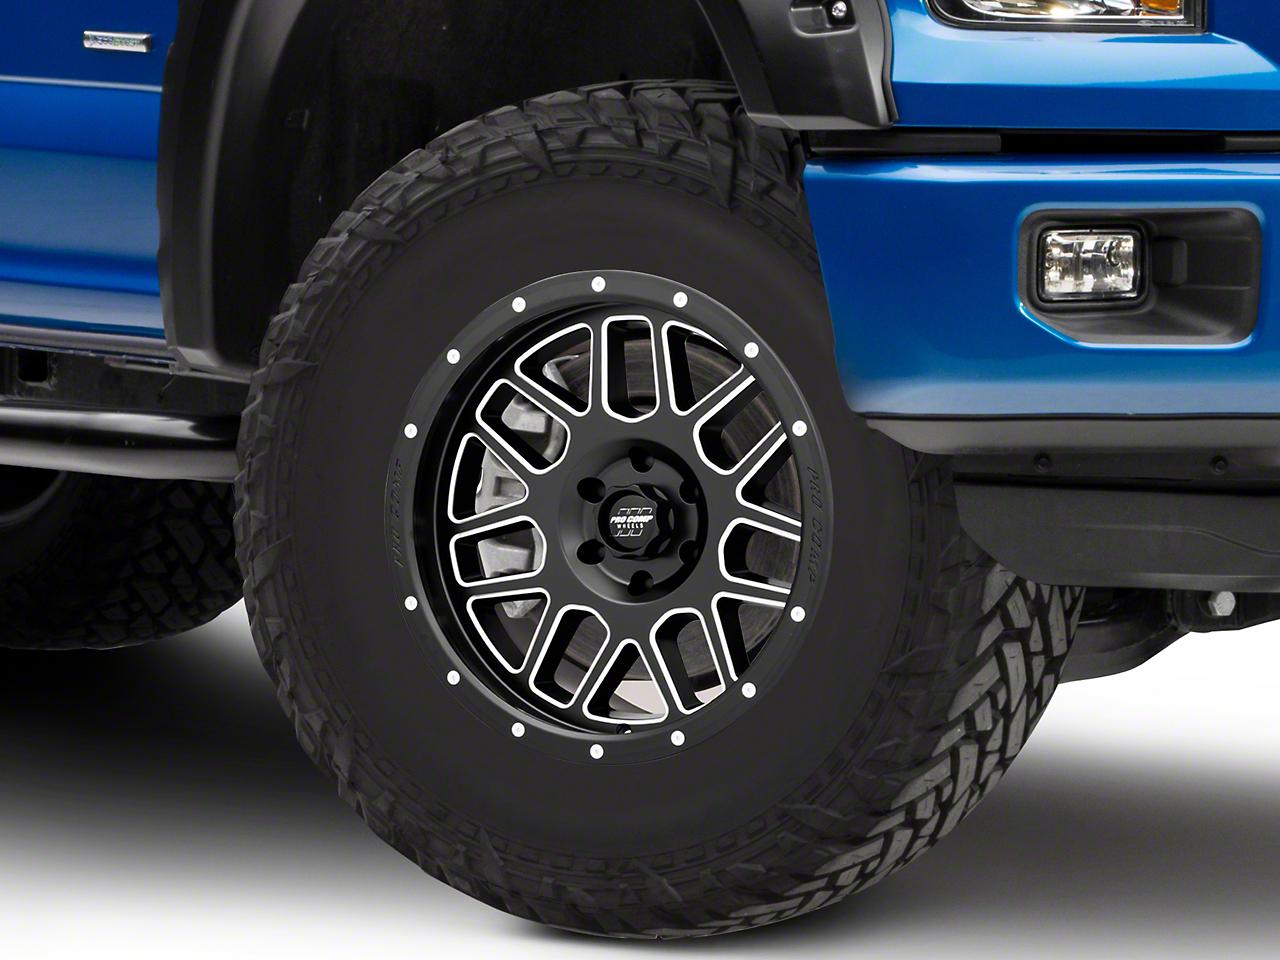 Pro Comp Vertigo Satin Black Milled 6-Lug Wheel - 17x9 (04-19 F-150)